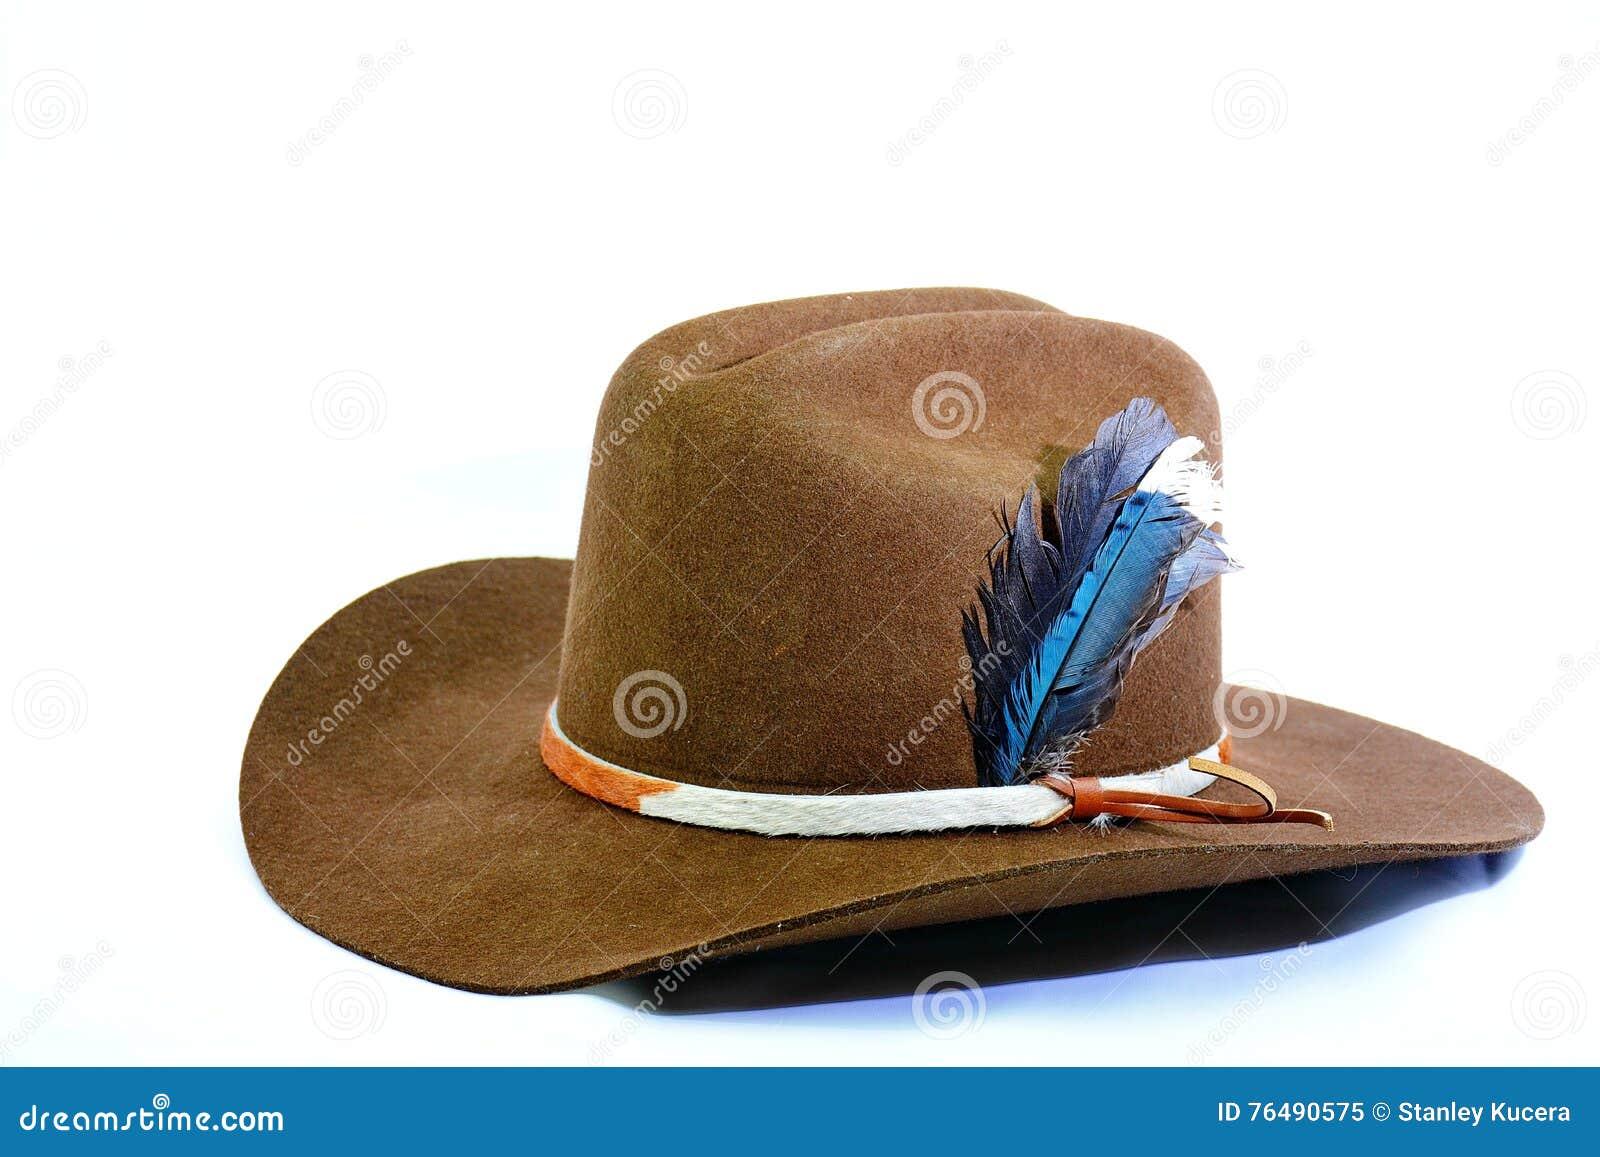 cowboyhut mit rindlederhutband und federn stockbild. Black Bedroom Furniture Sets. Home Design Ideas